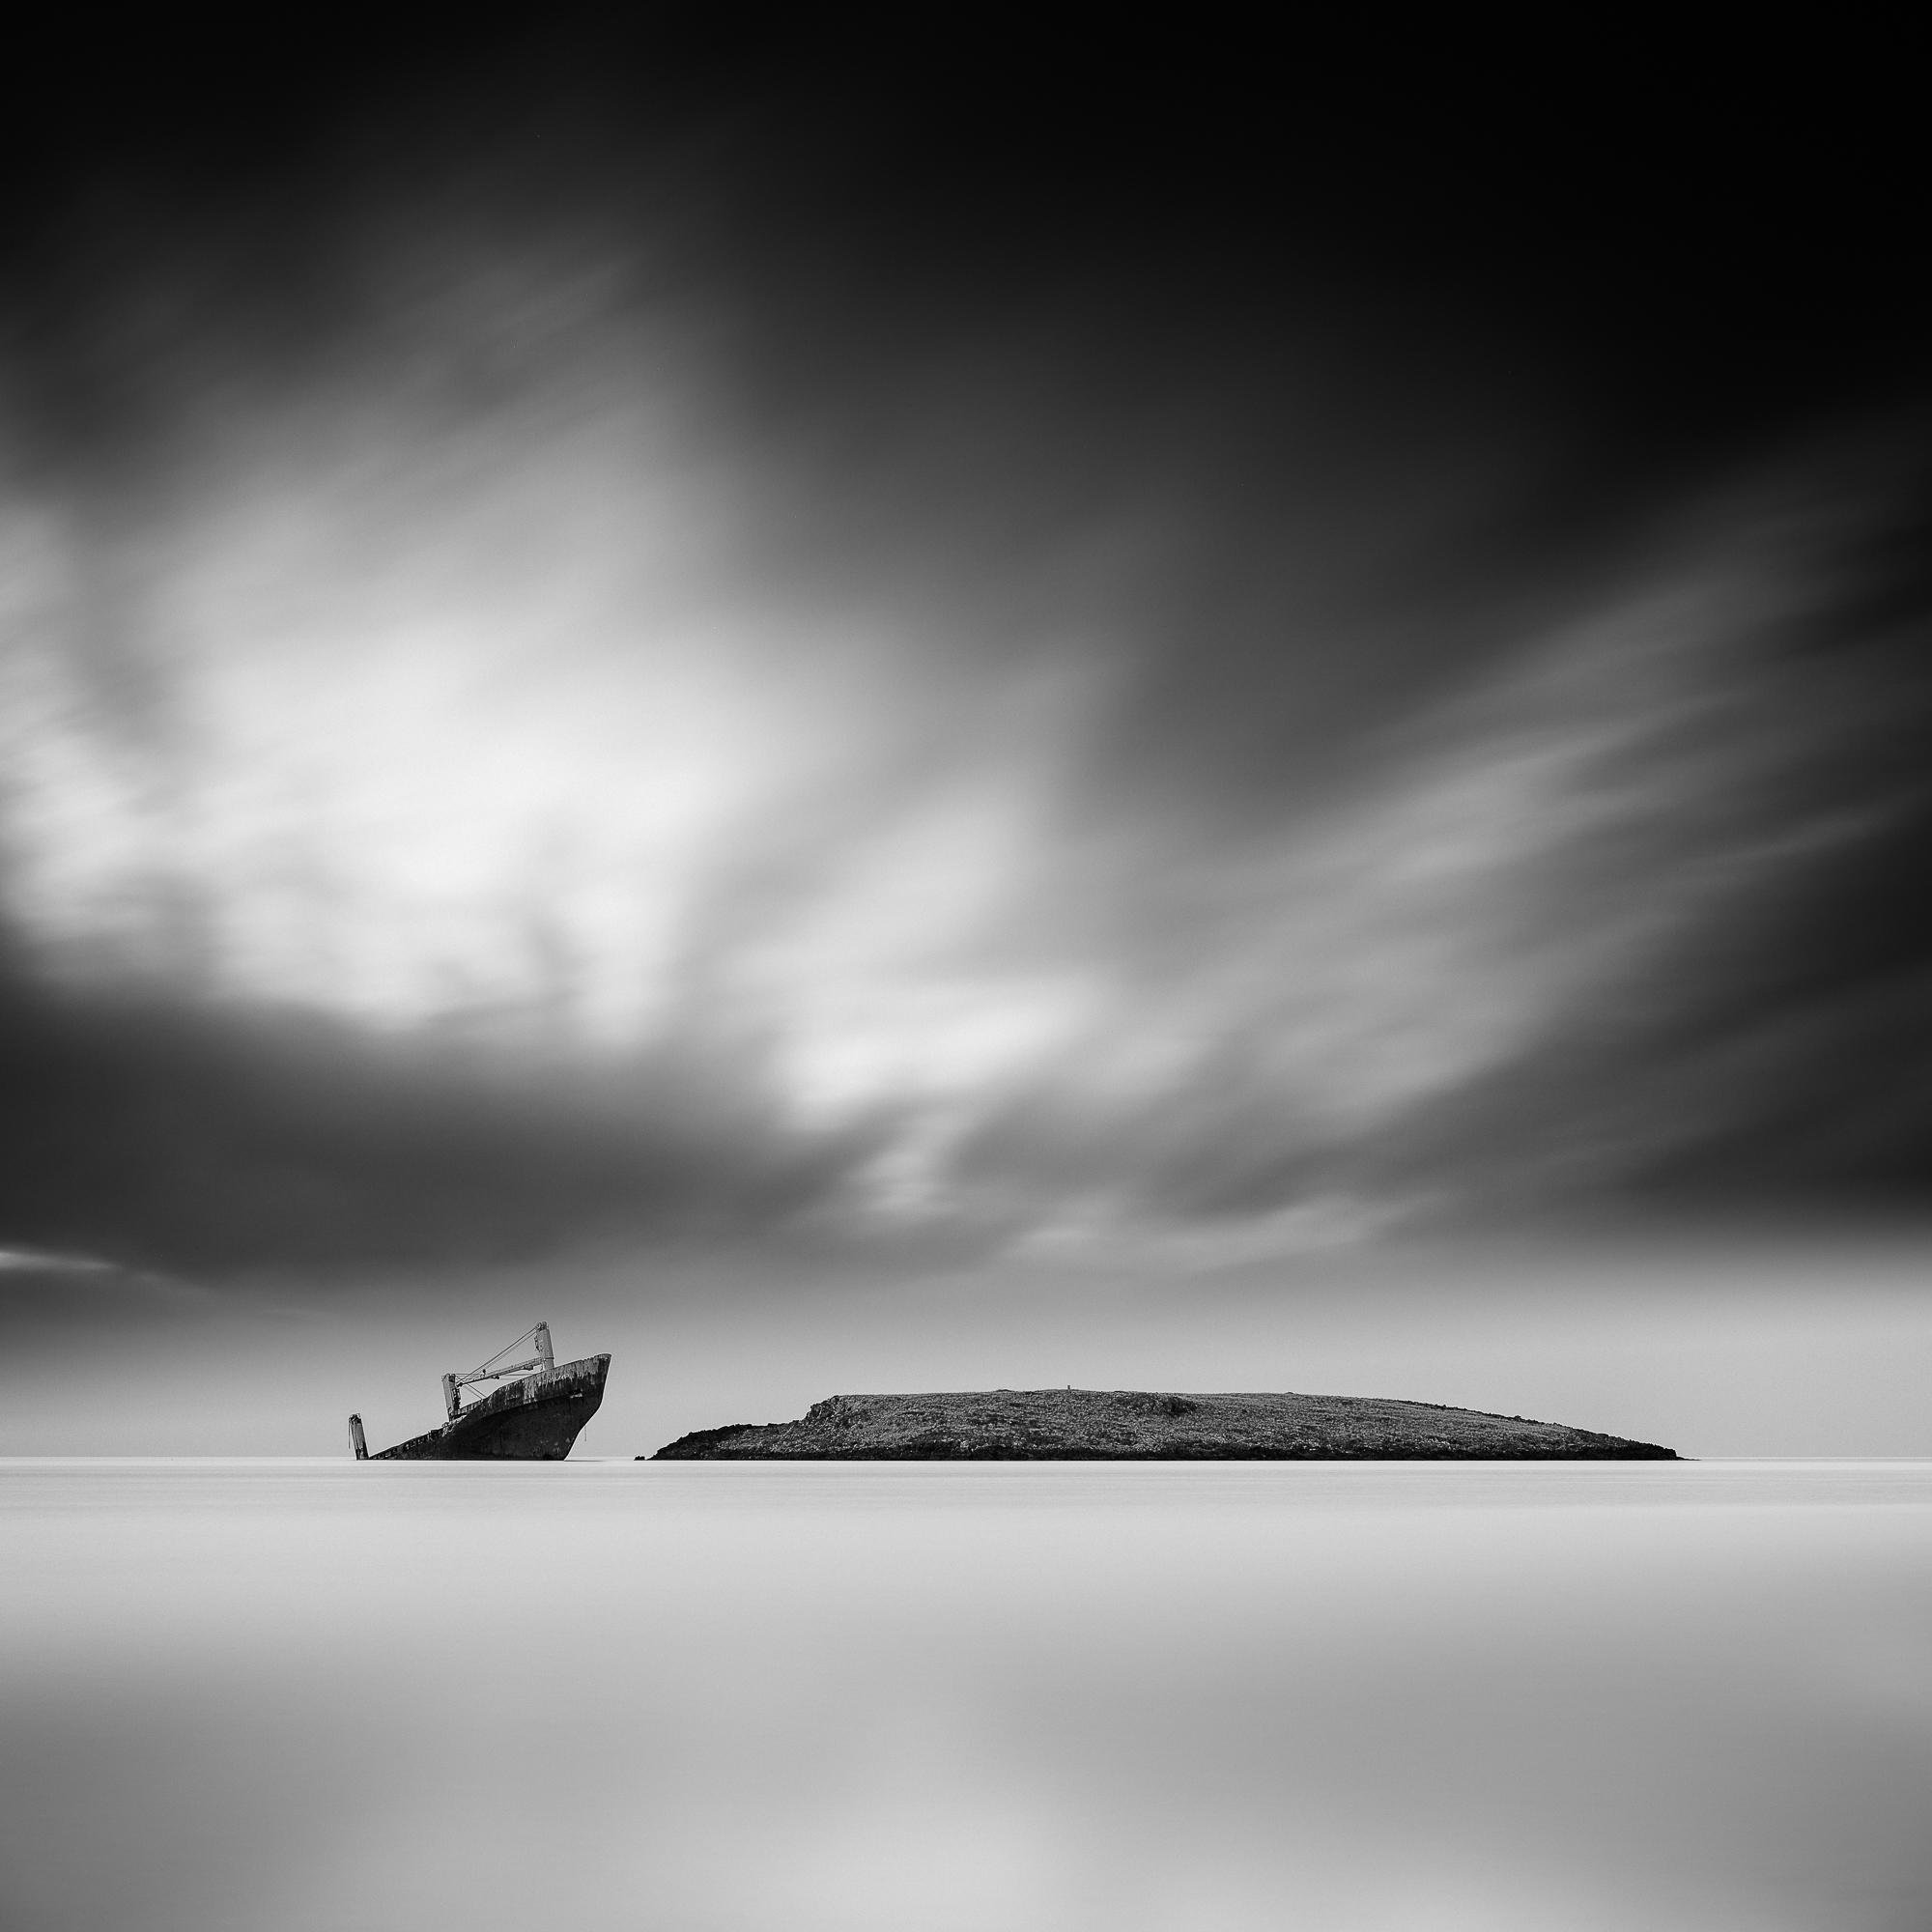 Kythira-Nordland-Shipwreck.jpg